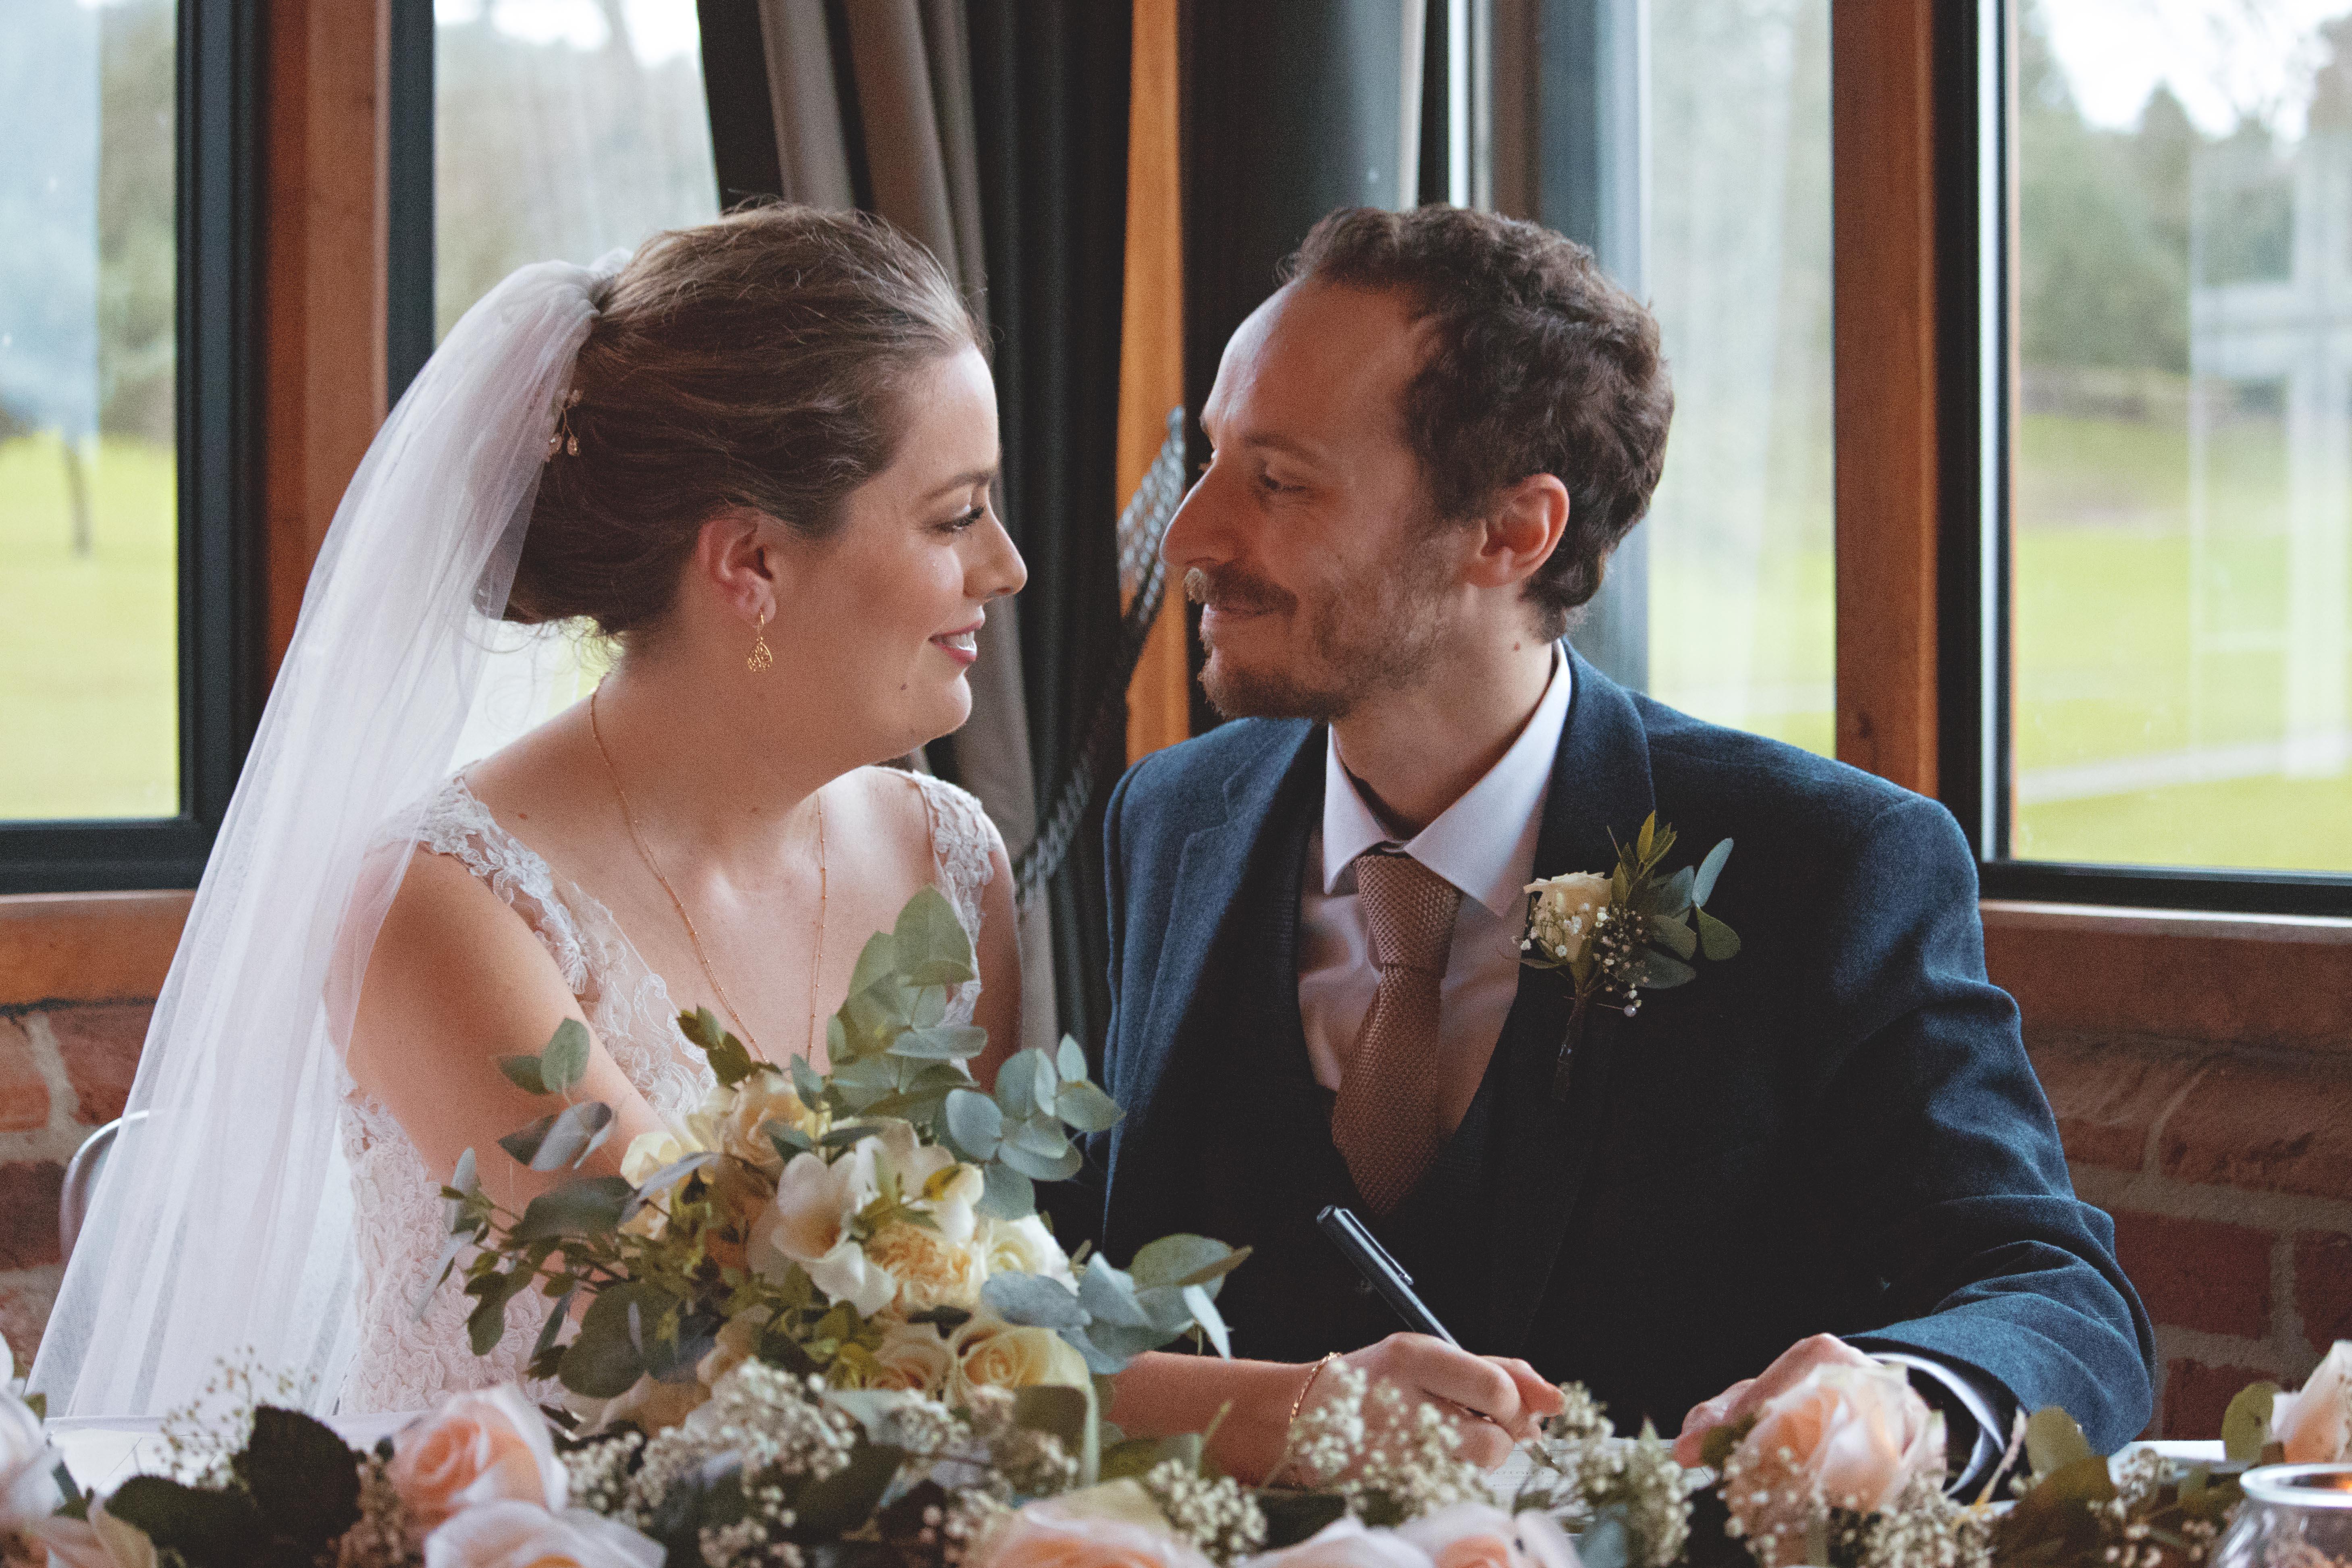 Signing the Wedding Register in Surrey